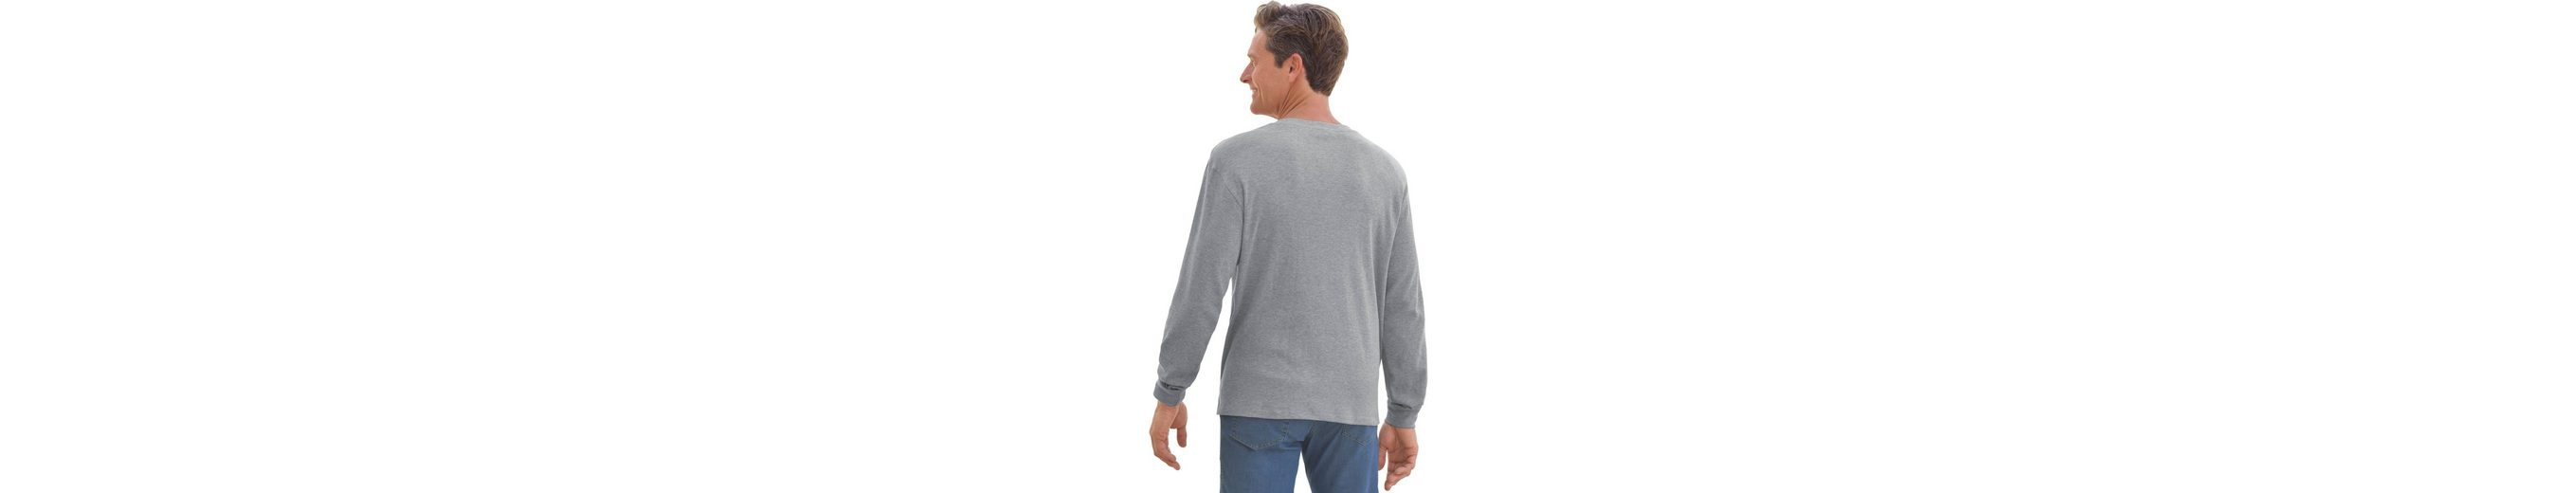 Catamaran Langarm-Shirt hautsympathischem, atmungsaktivem Waffelpikee